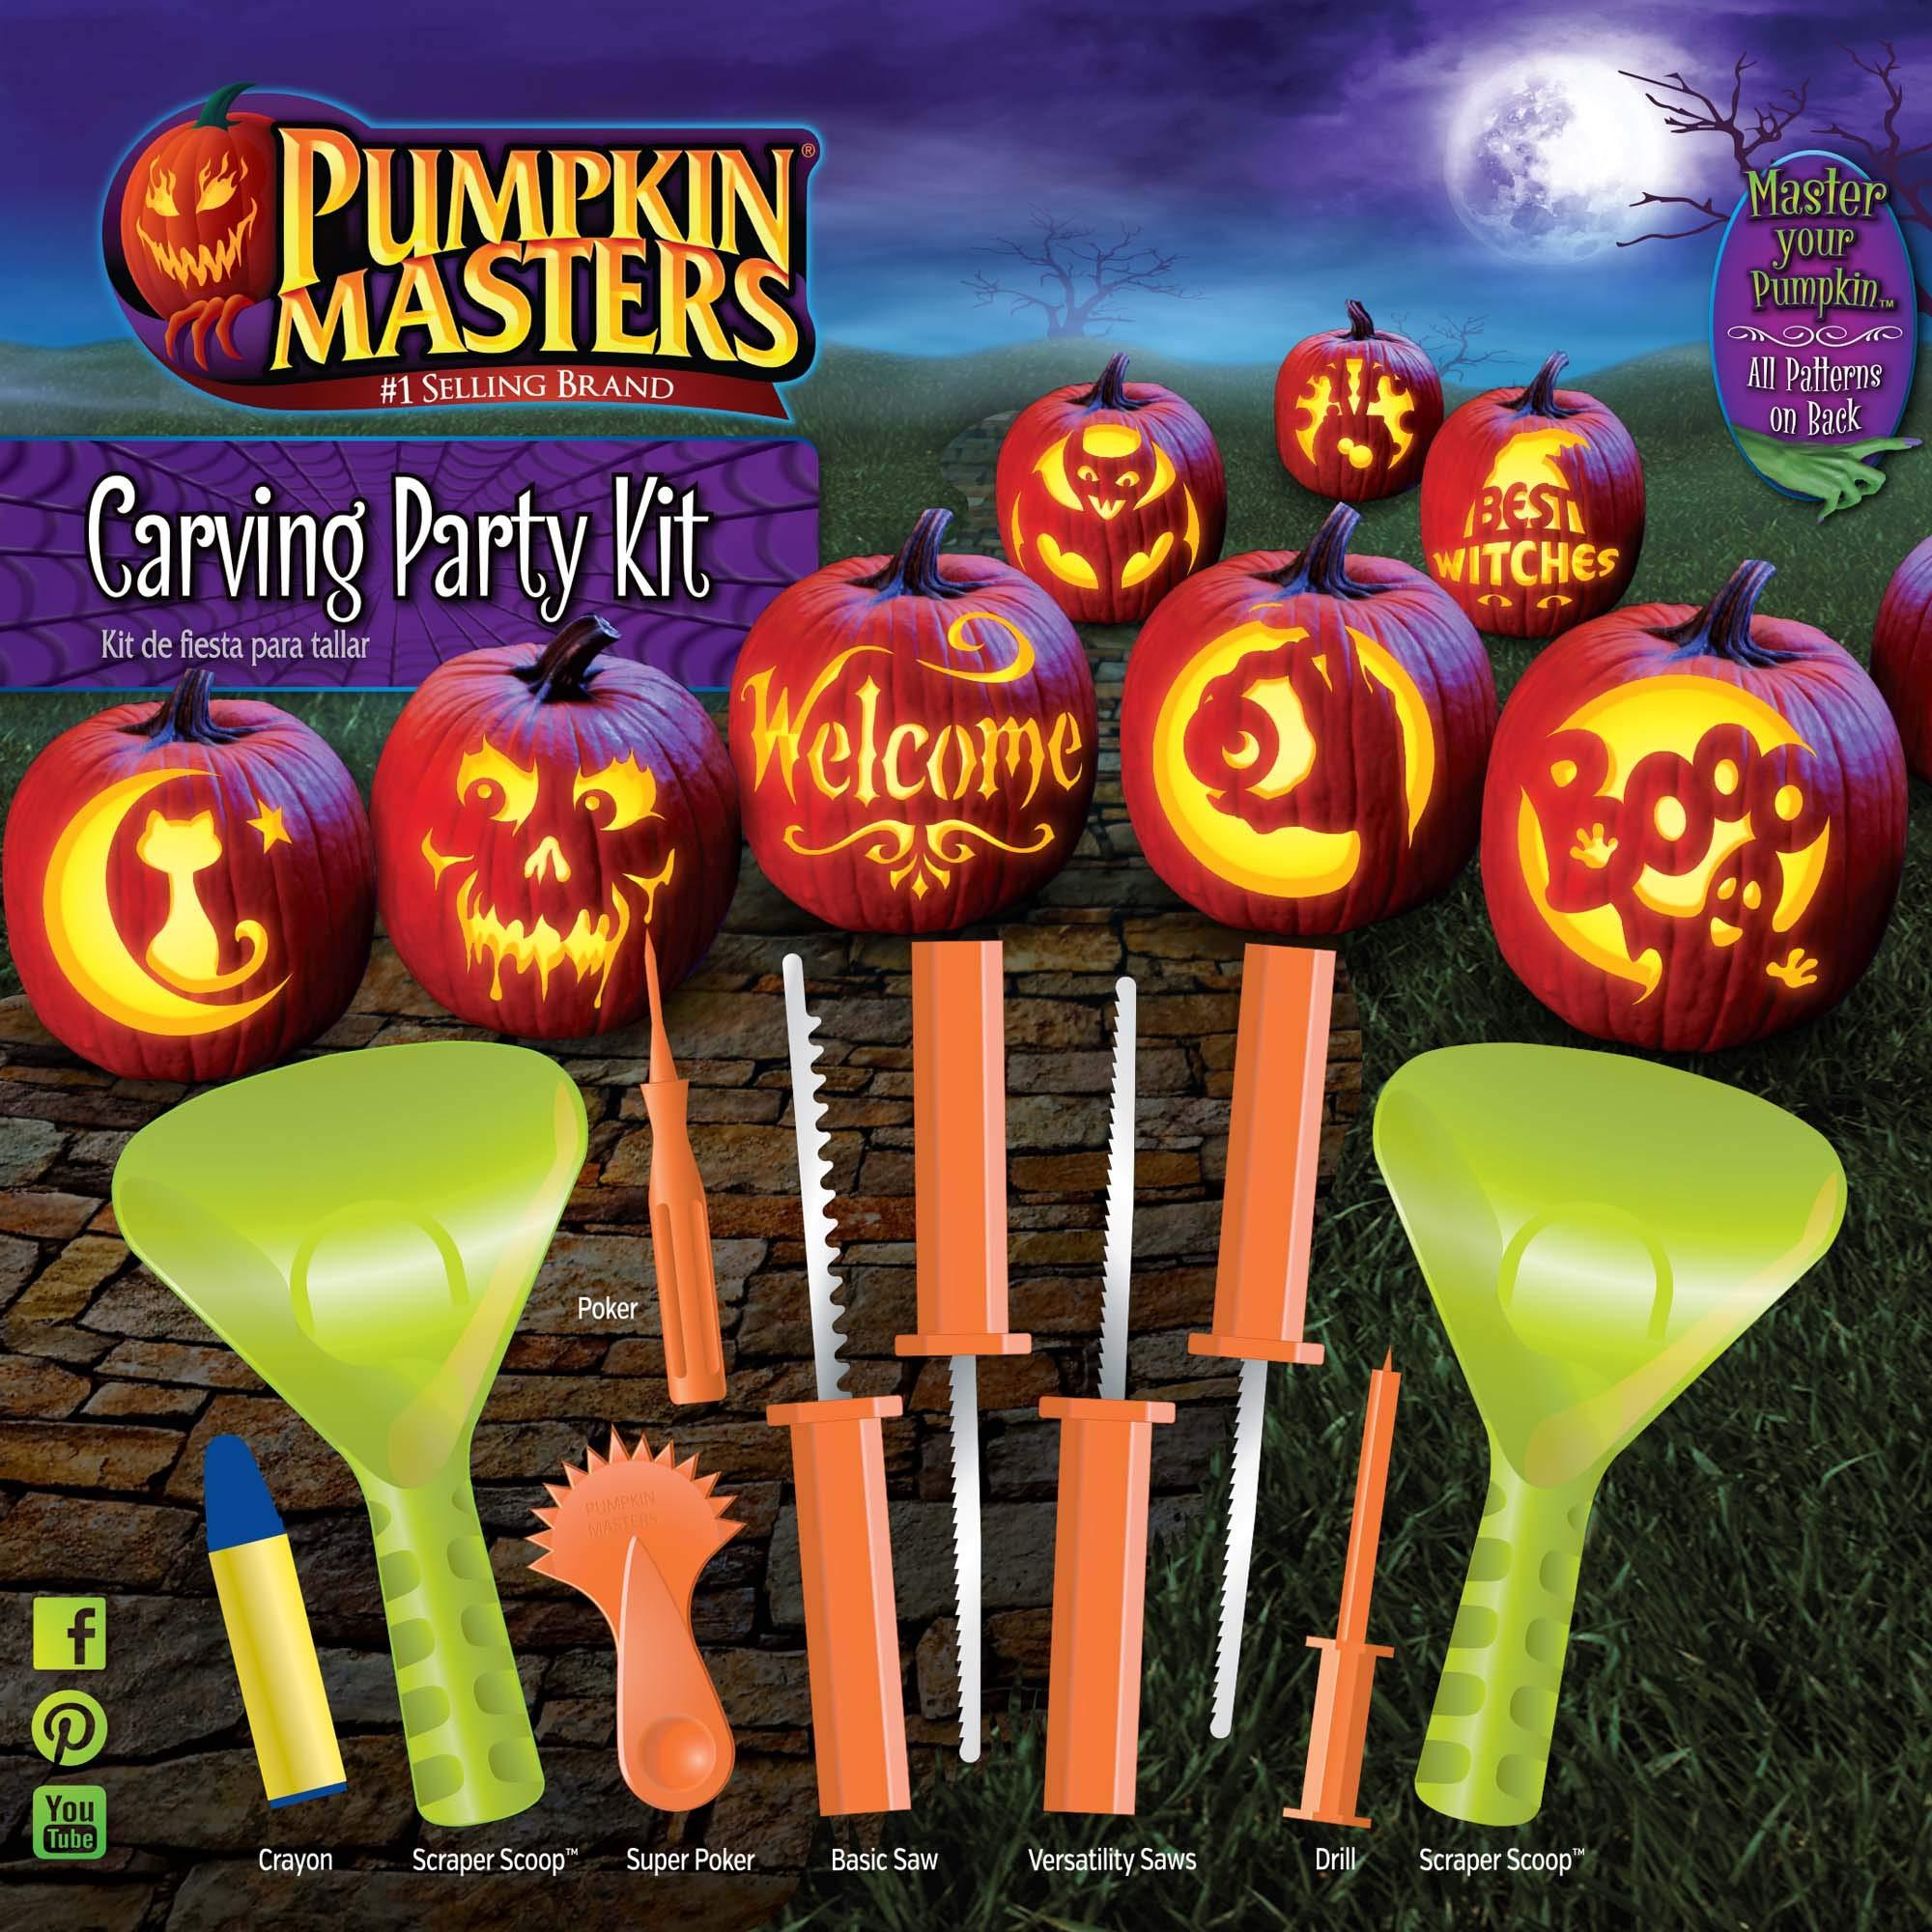 Pumpkin Masters Halloween Pumpkin Party Carving kit - 12 patterns by Pumpkin Masters